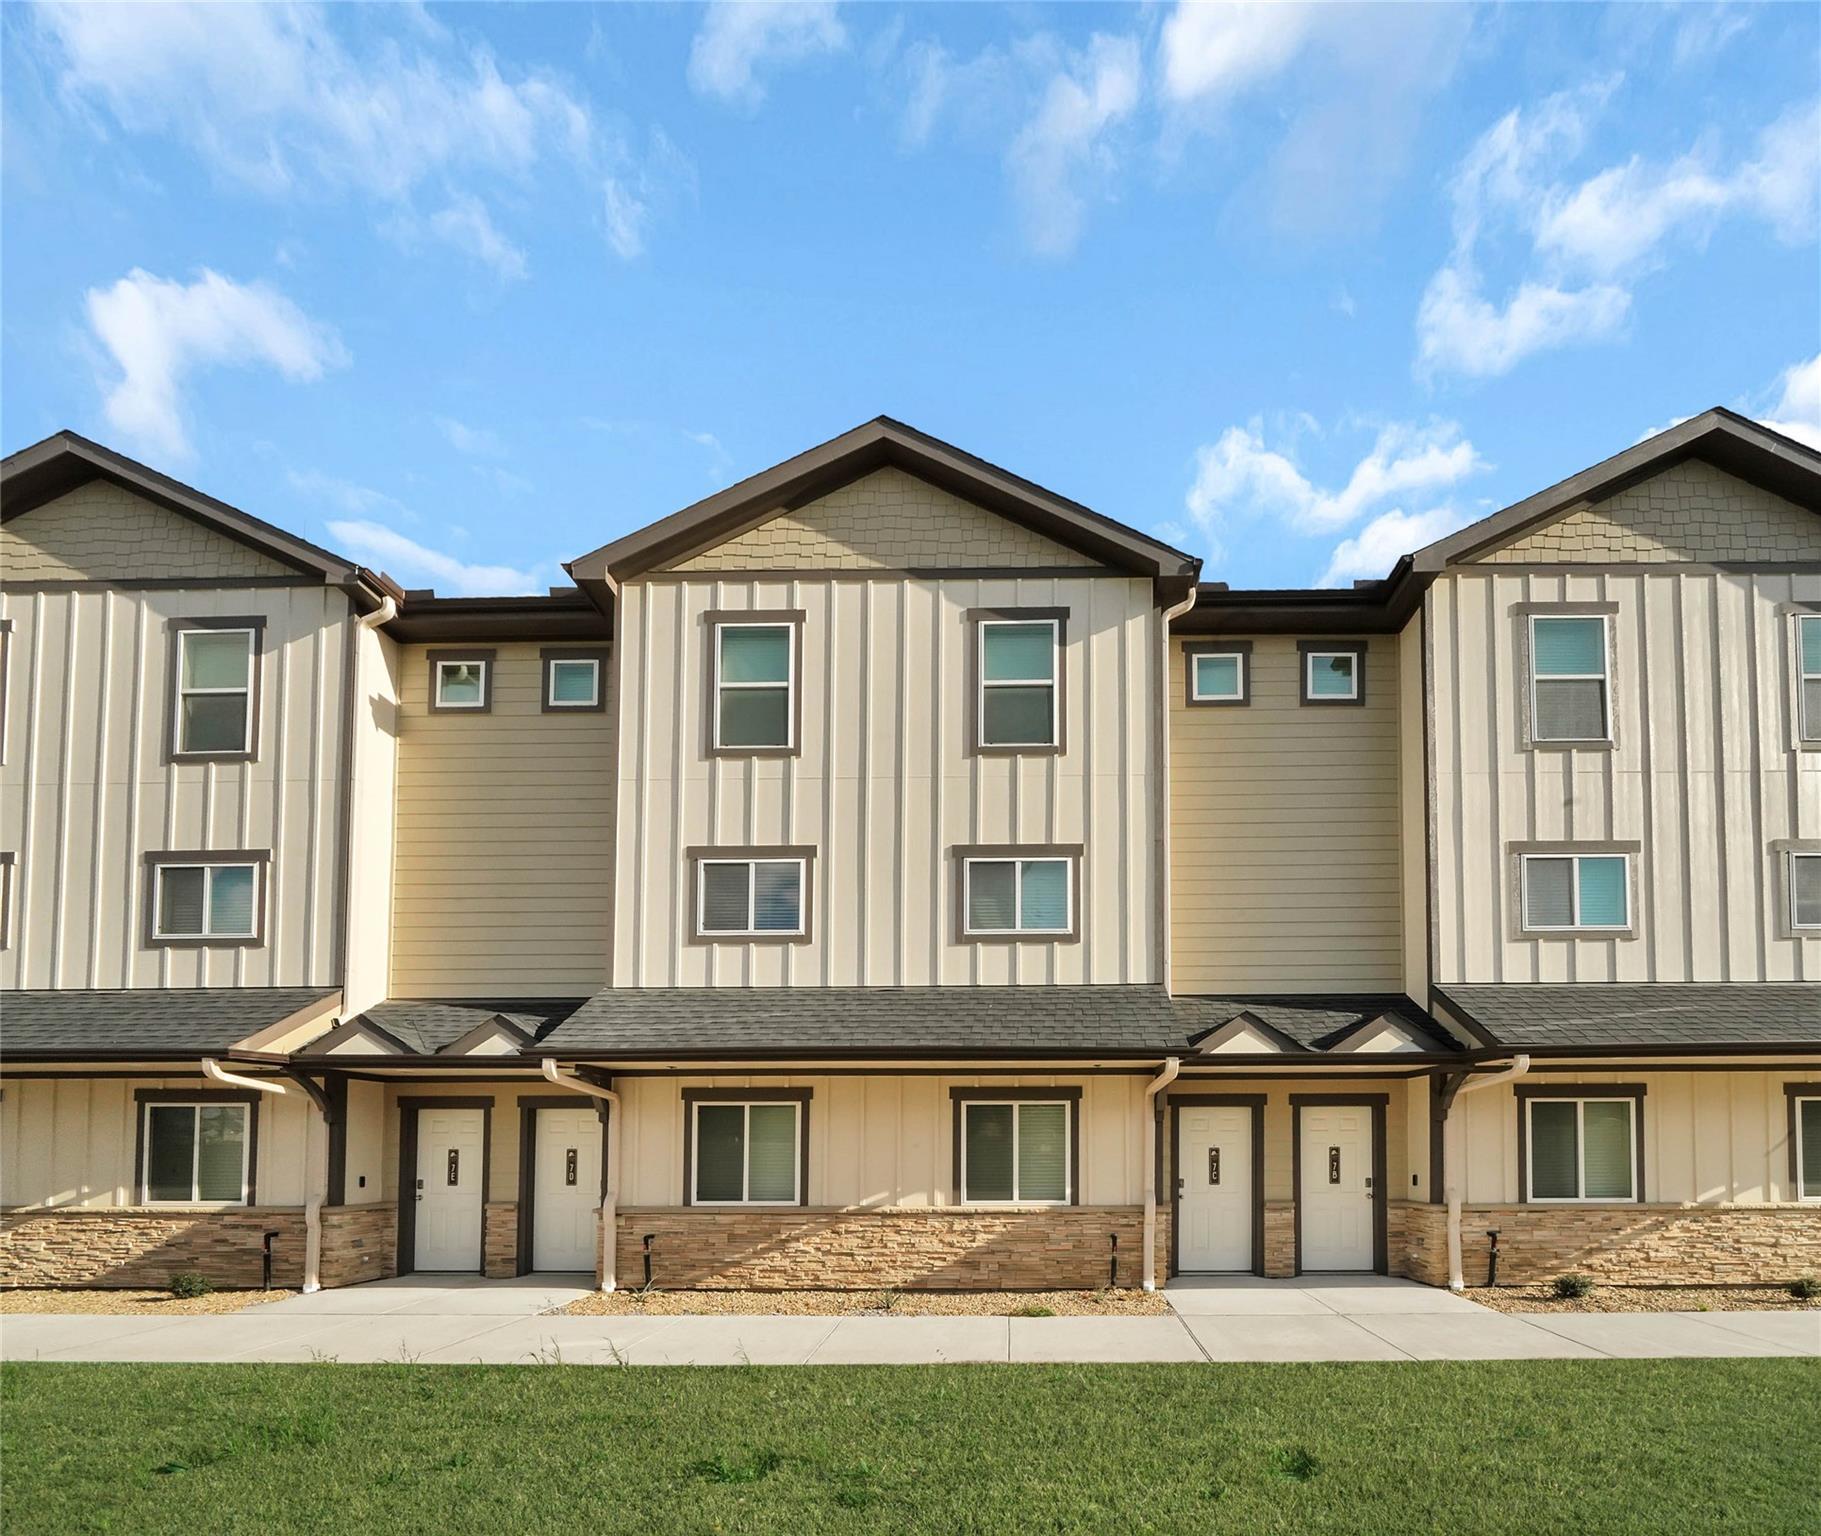 12603 Telge #7A-D Property Photo - Cypress, TX real estate listing